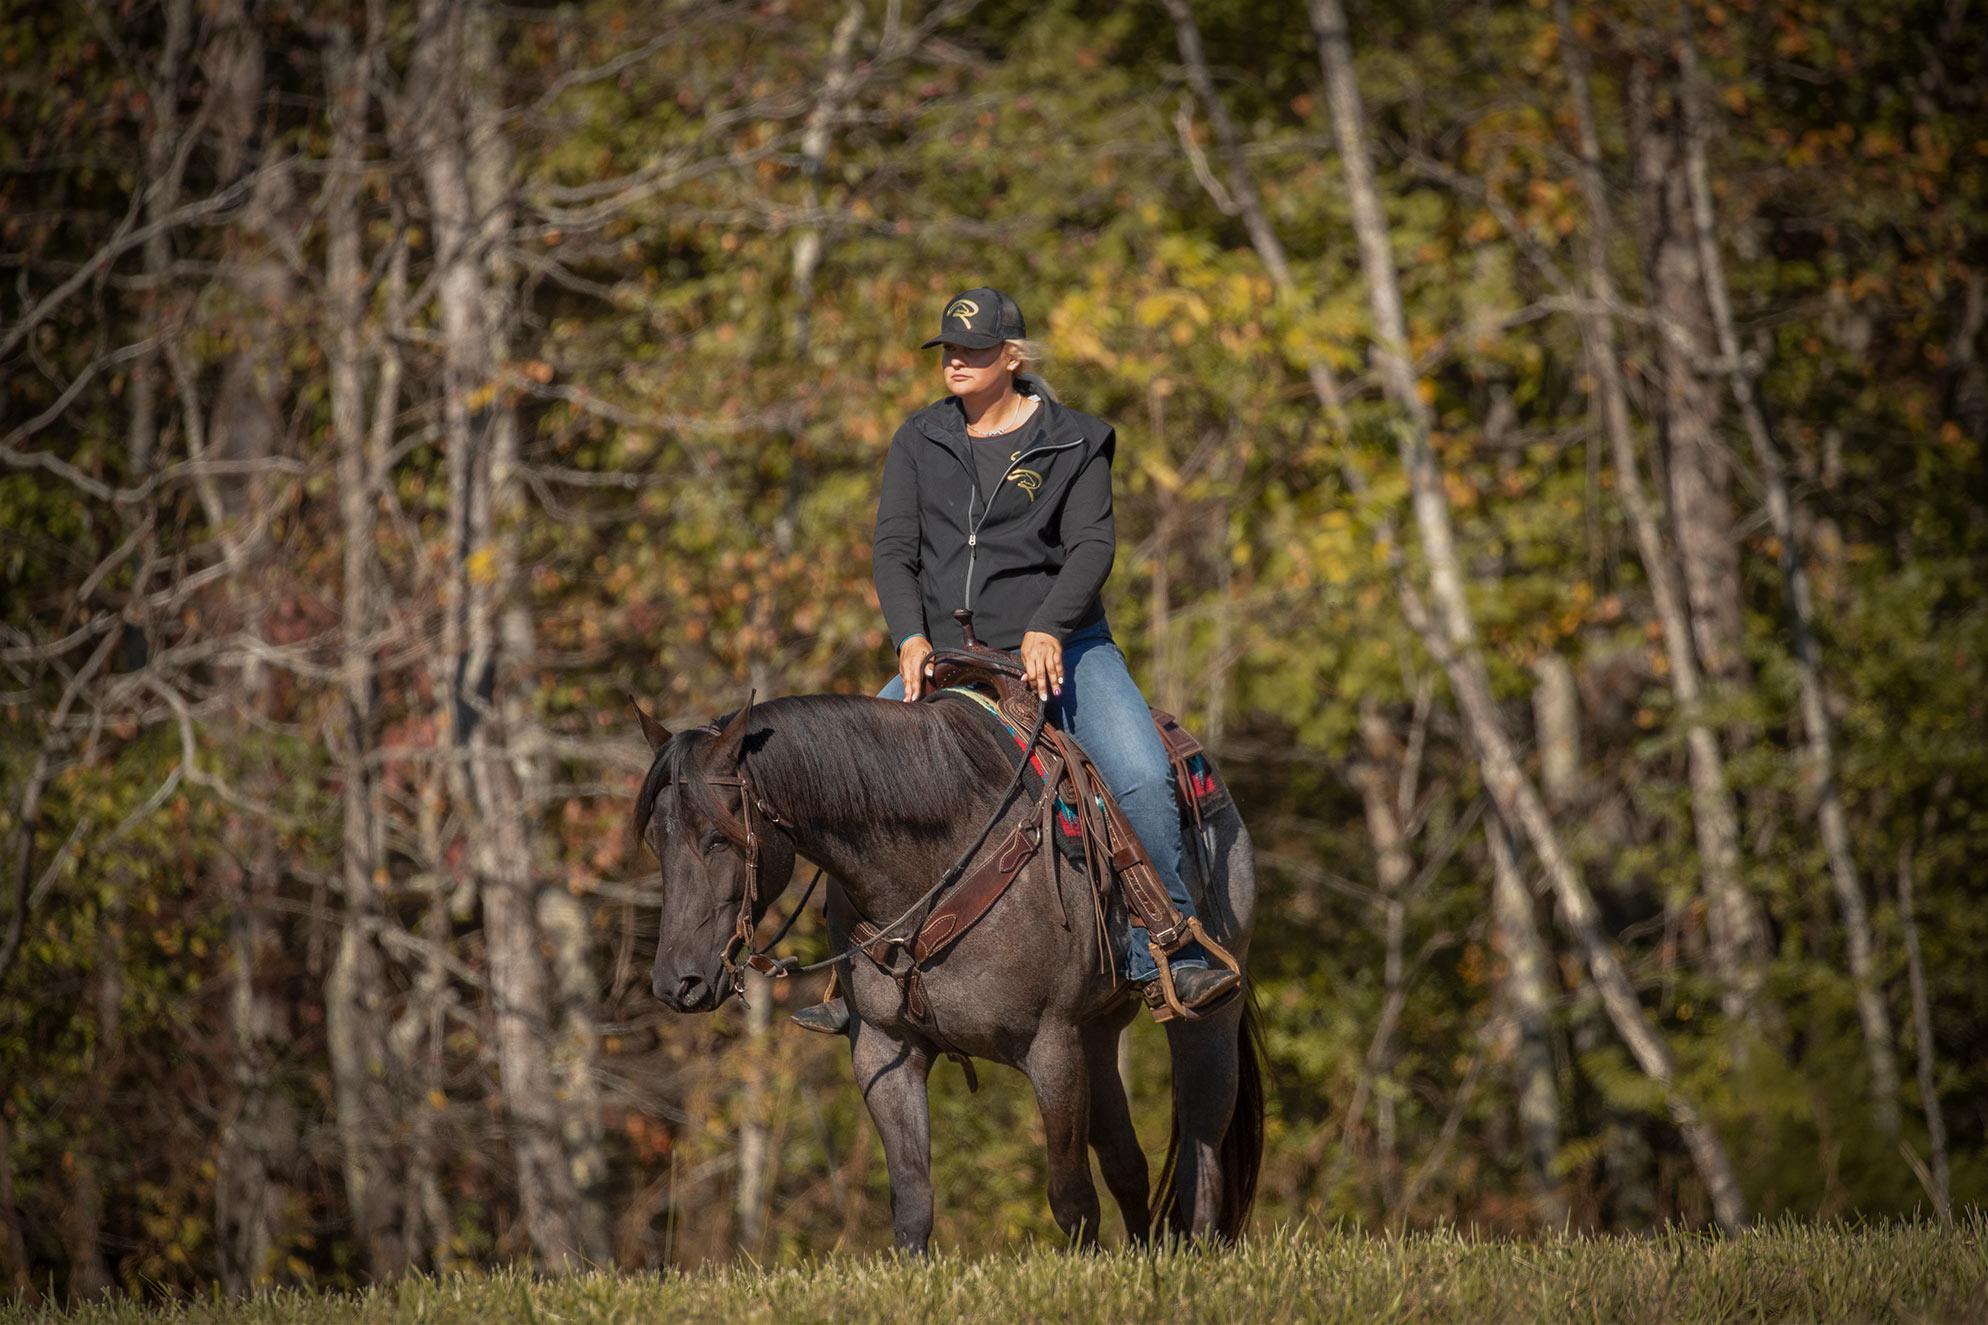 011-Gunsmoke-Luxury-Trail-Horse-For-Sale